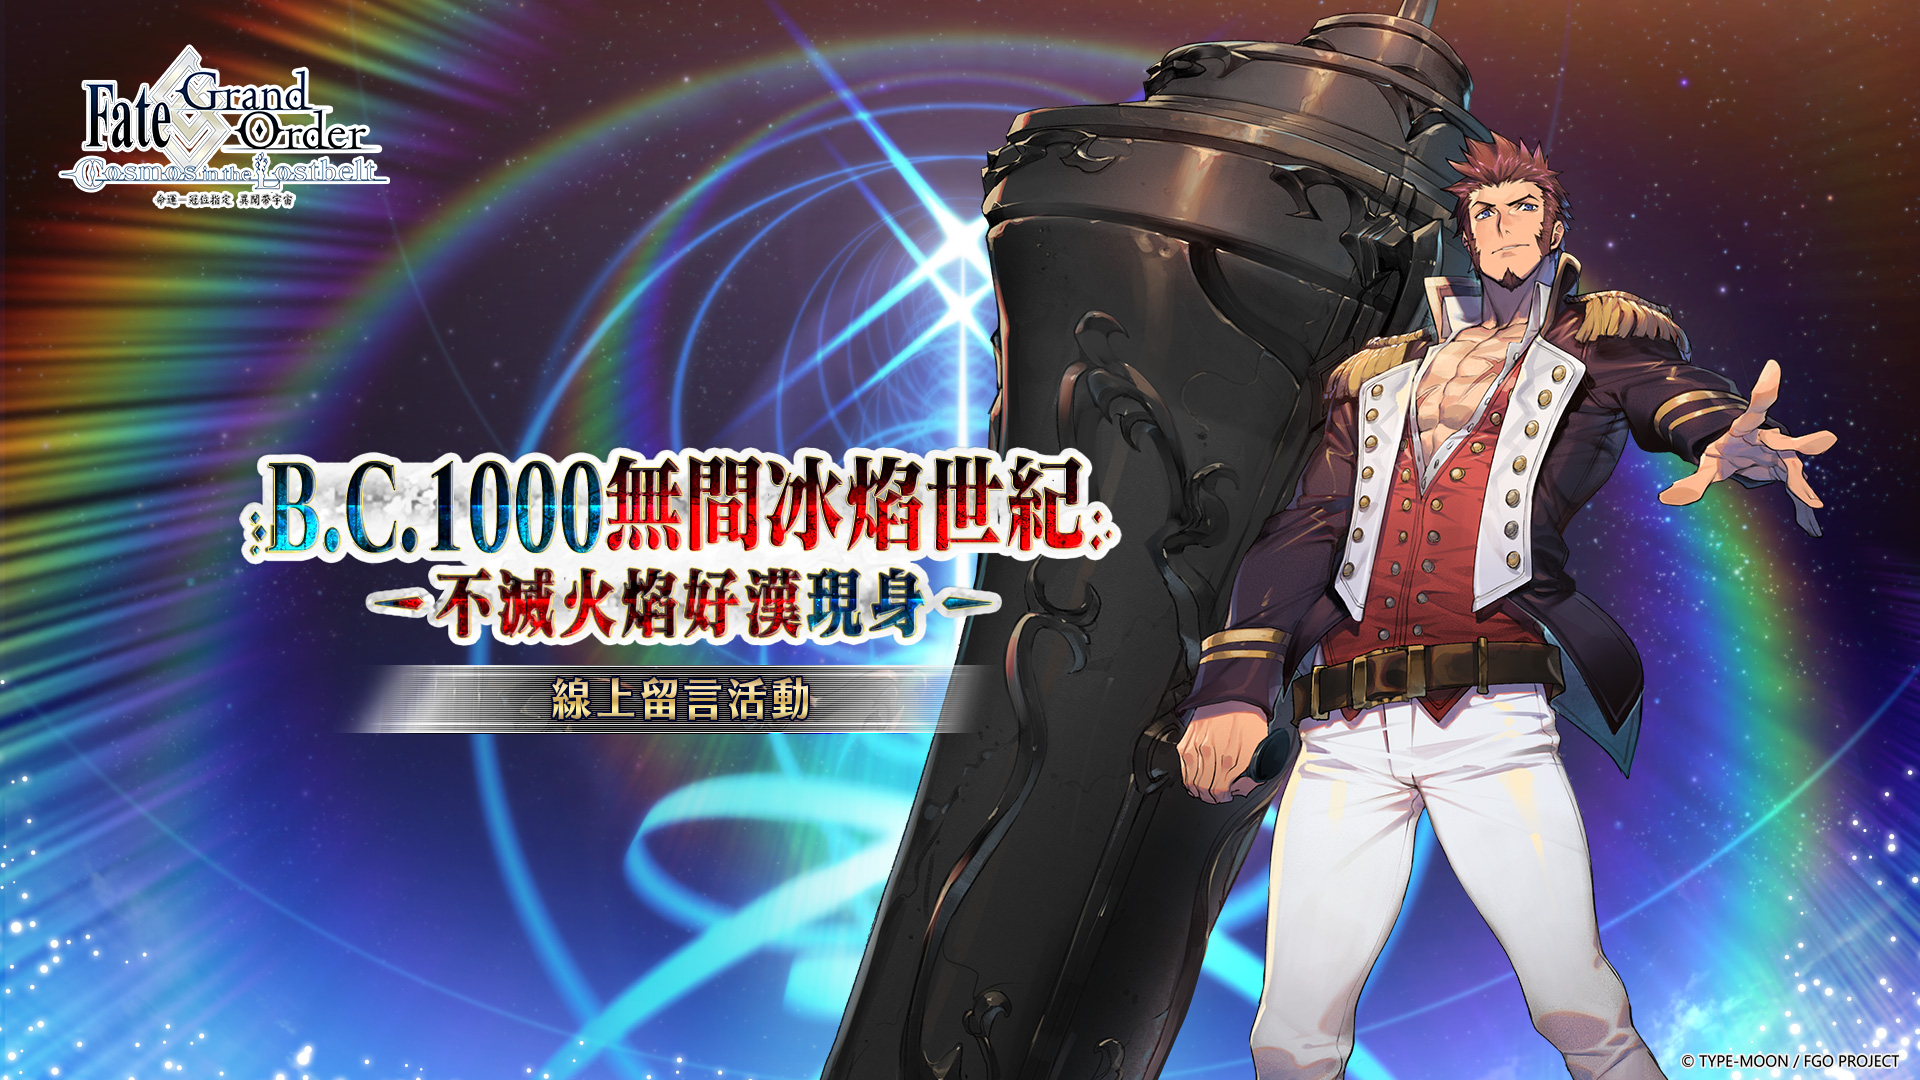 《Fate/Grand Order》繁中版舉辦線上祈福活動,號召台港澳御主齊力集氣!攜手點亮「B.C. 1000無間冰焰世紀」留言牆,一同獲得全服獎勵!